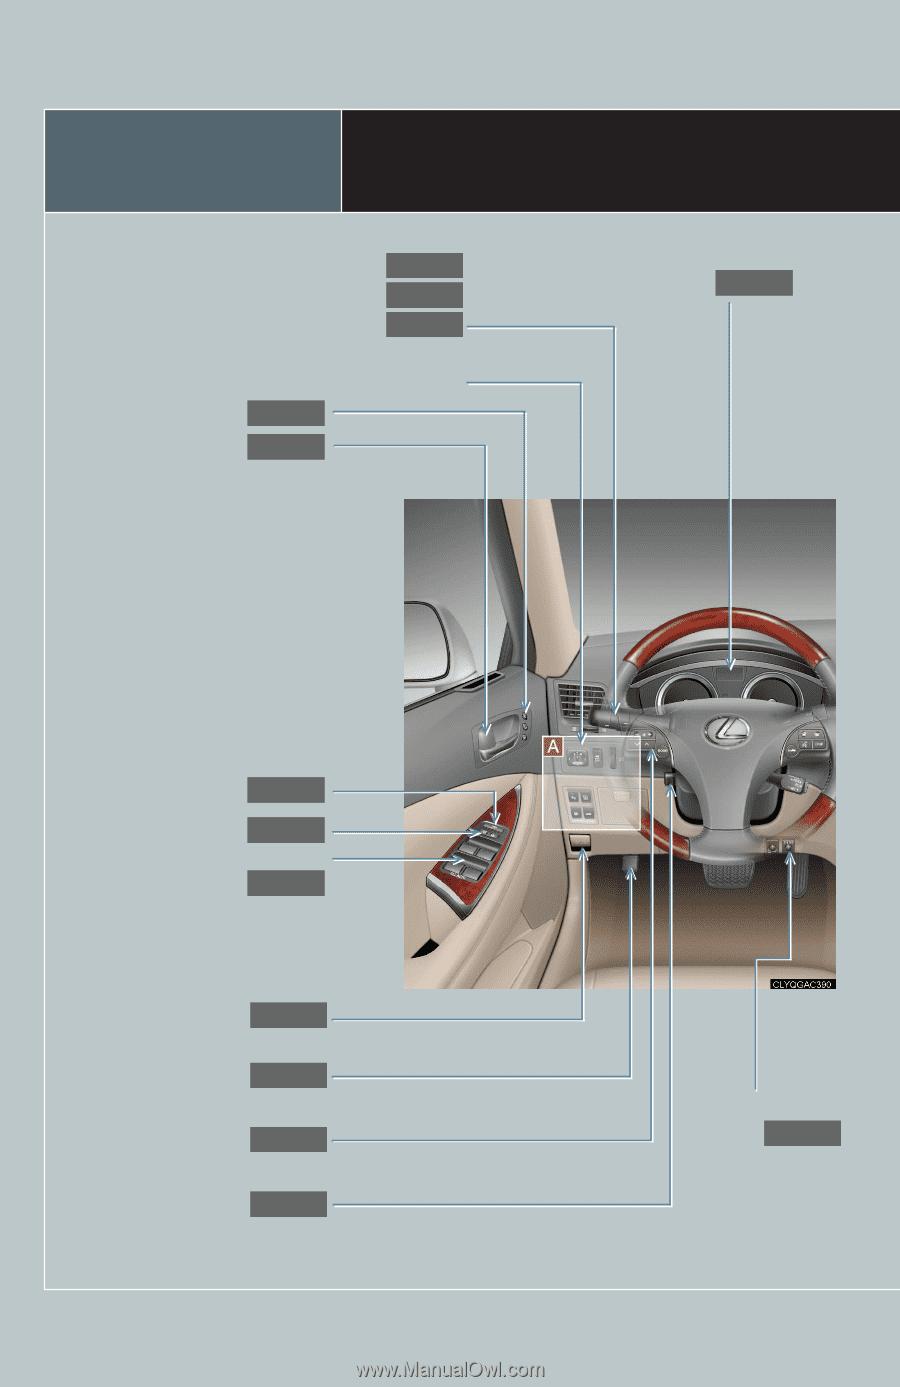 2015 lexus rx 350 owners manual pdf